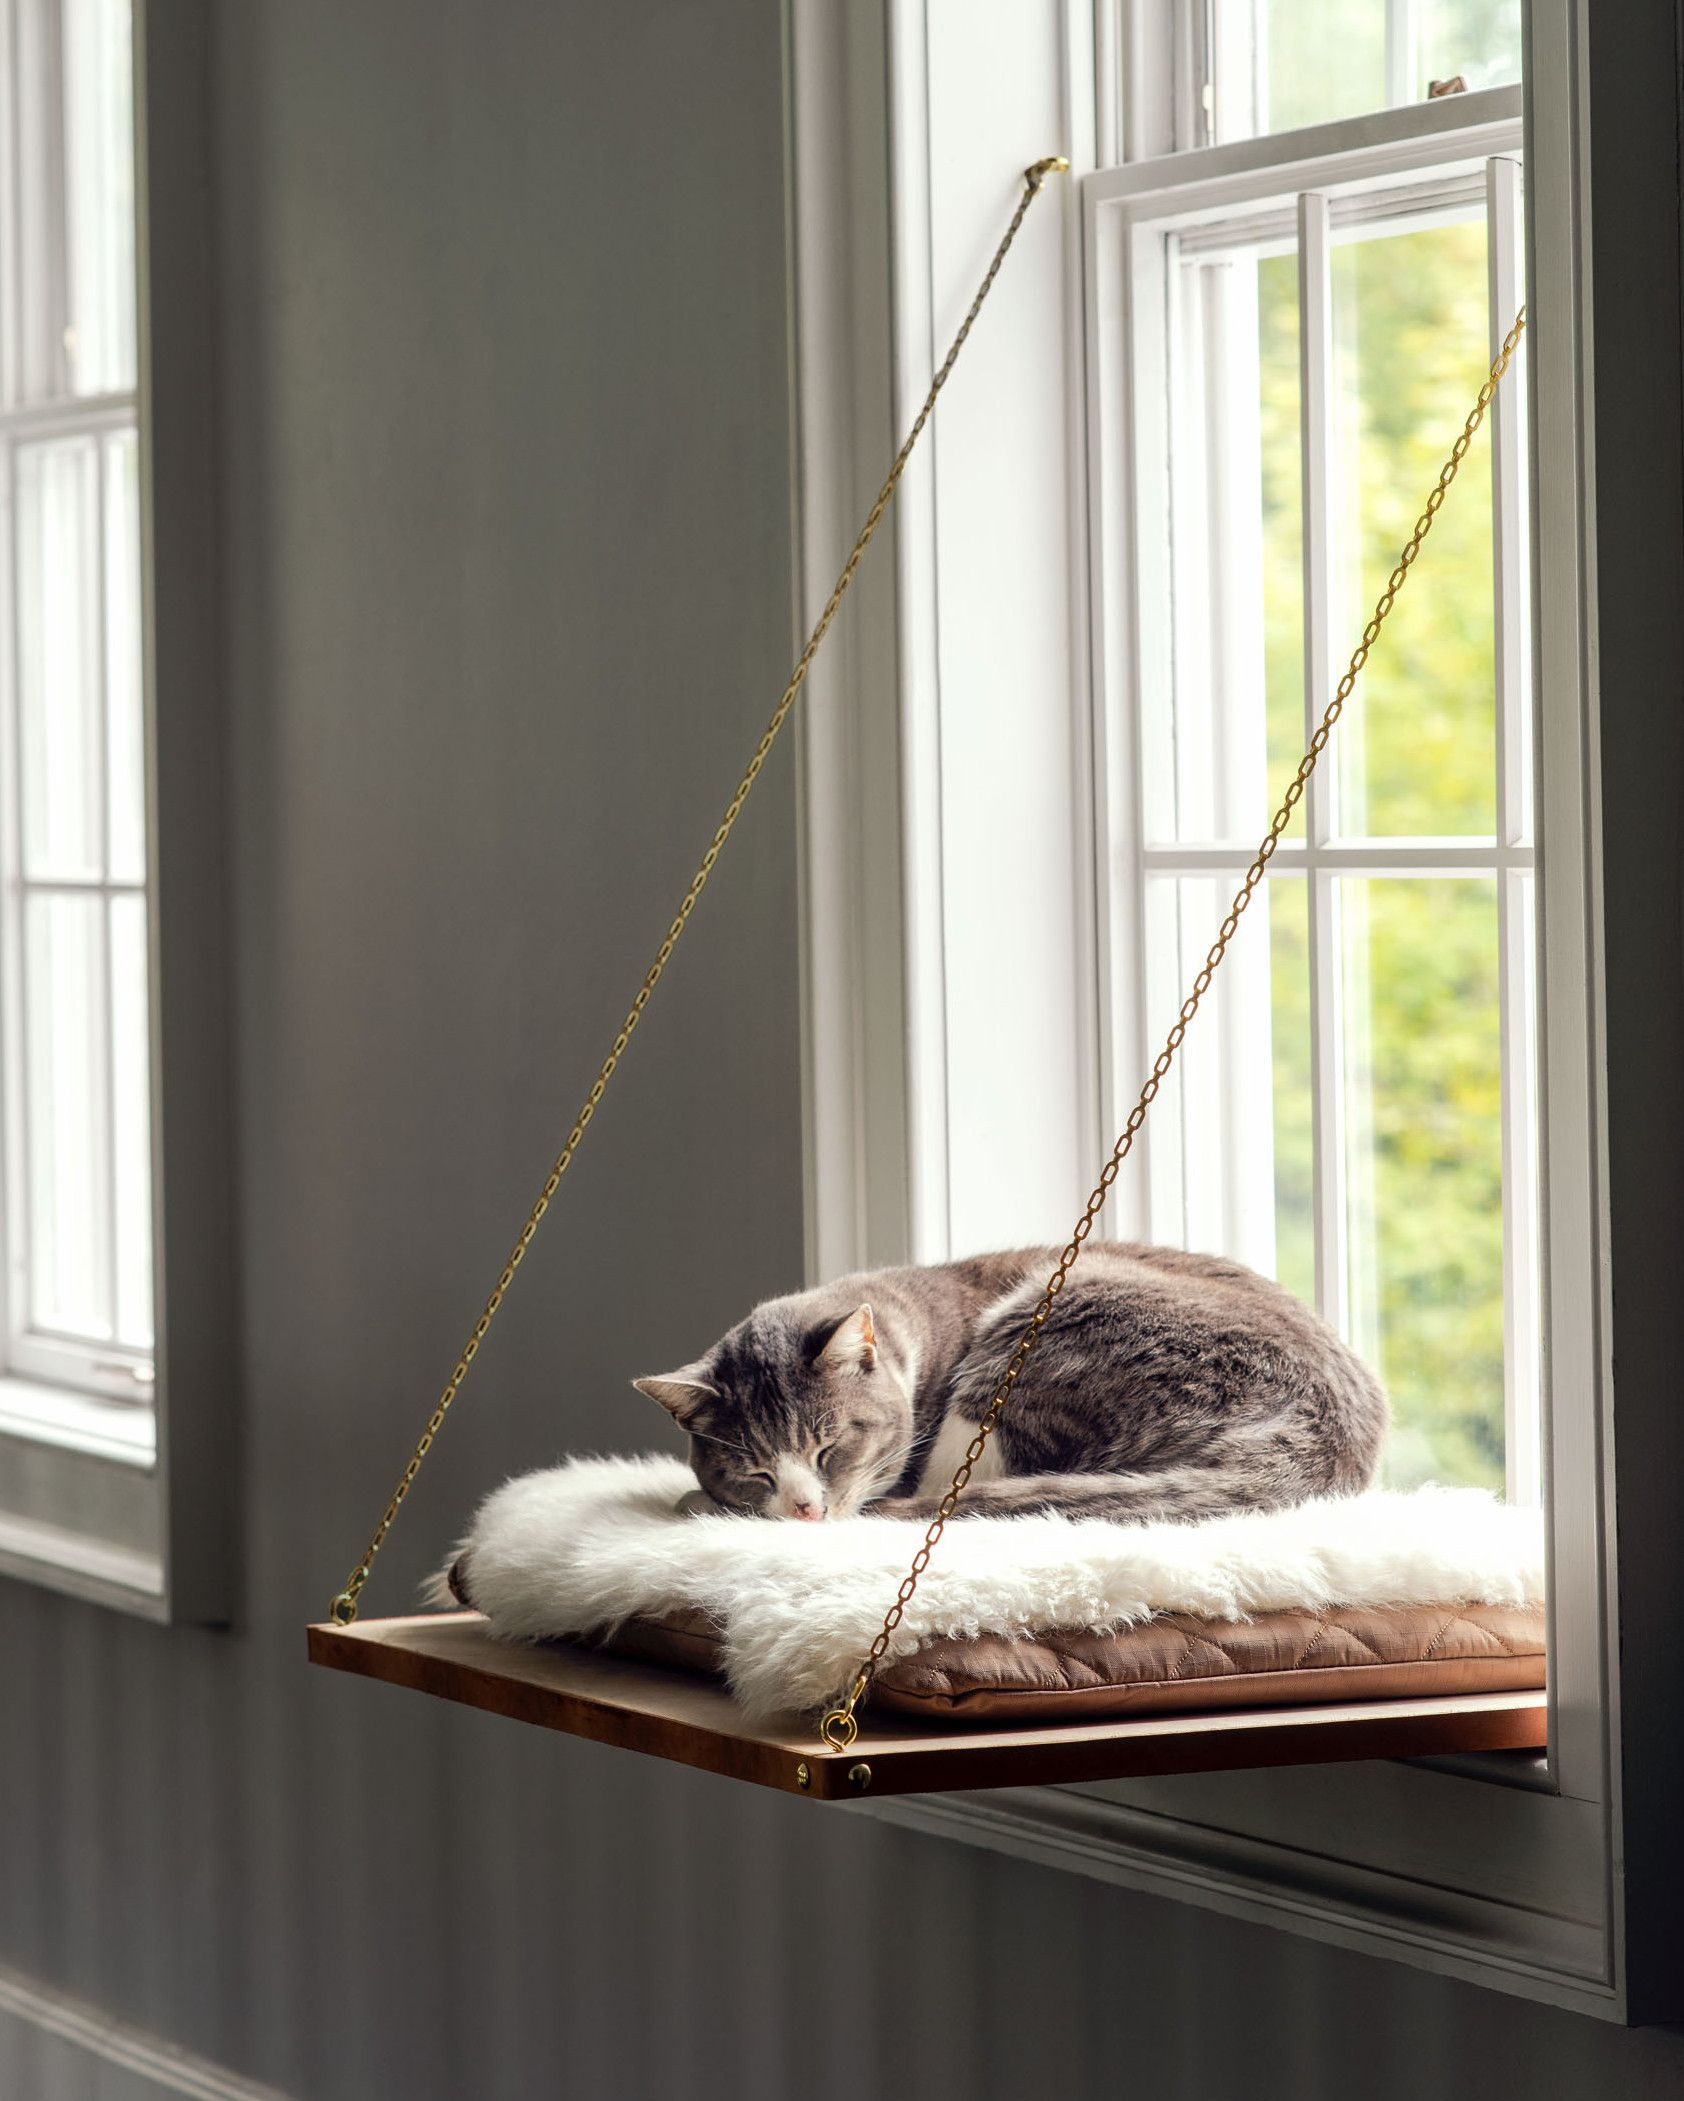 Cat window perch diy cat bed cat window perch cat window